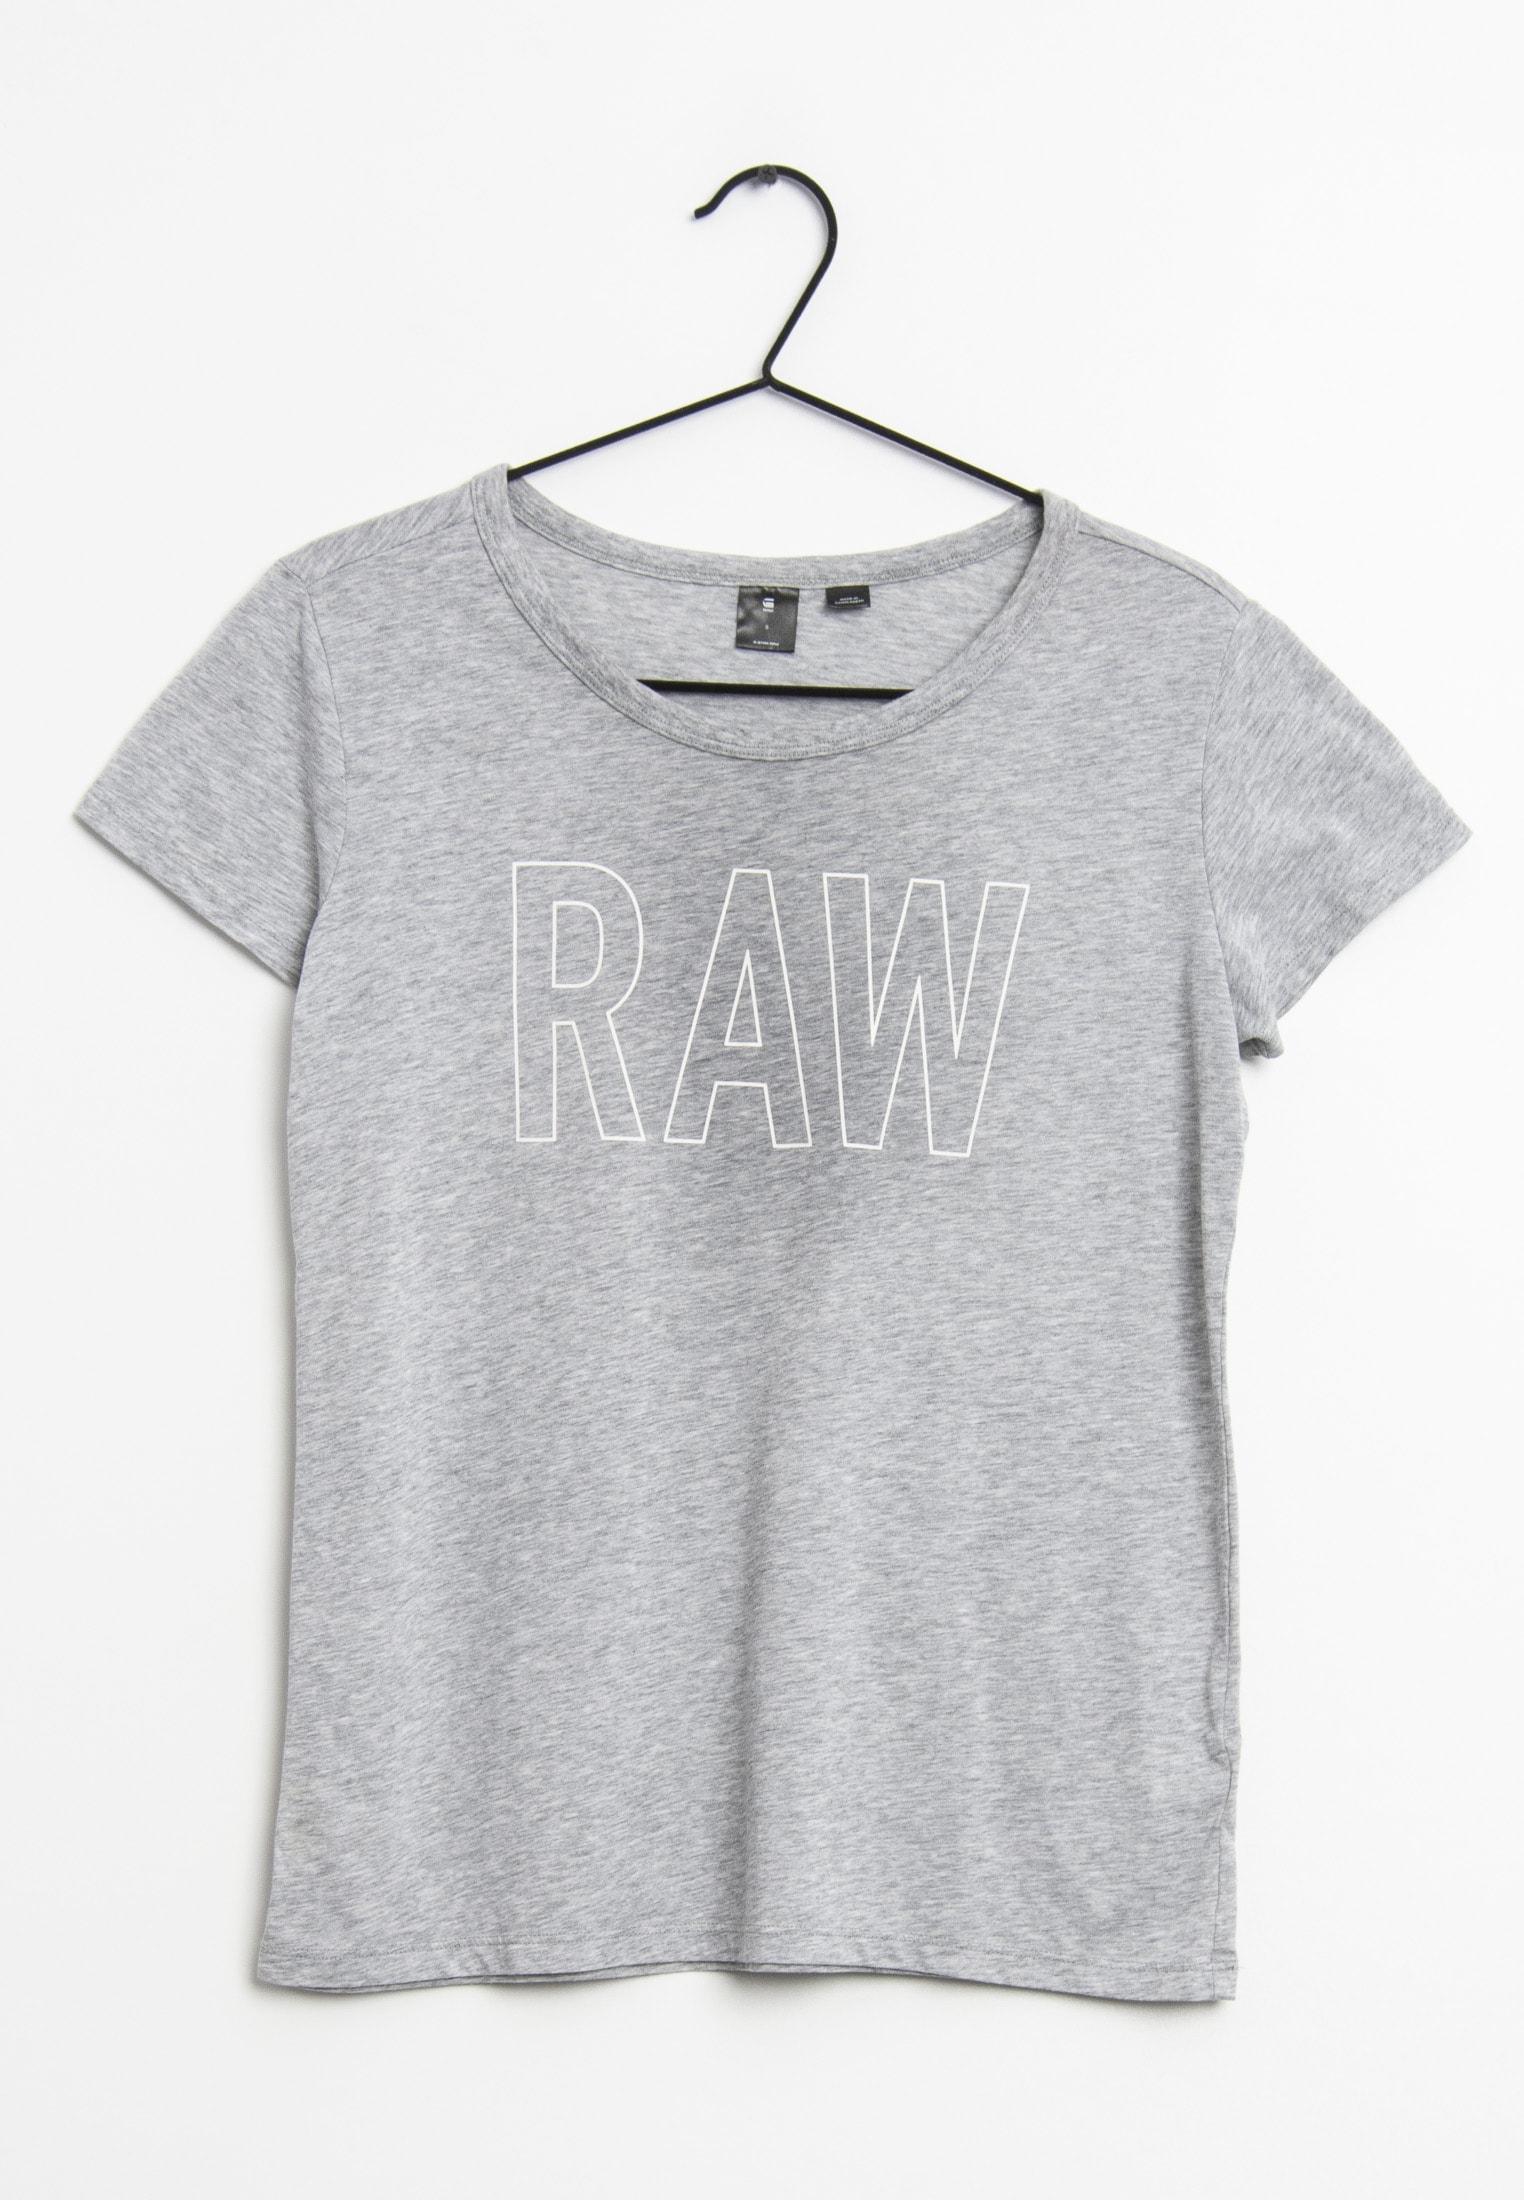 G-Star T-Shirt Blau Gr.S